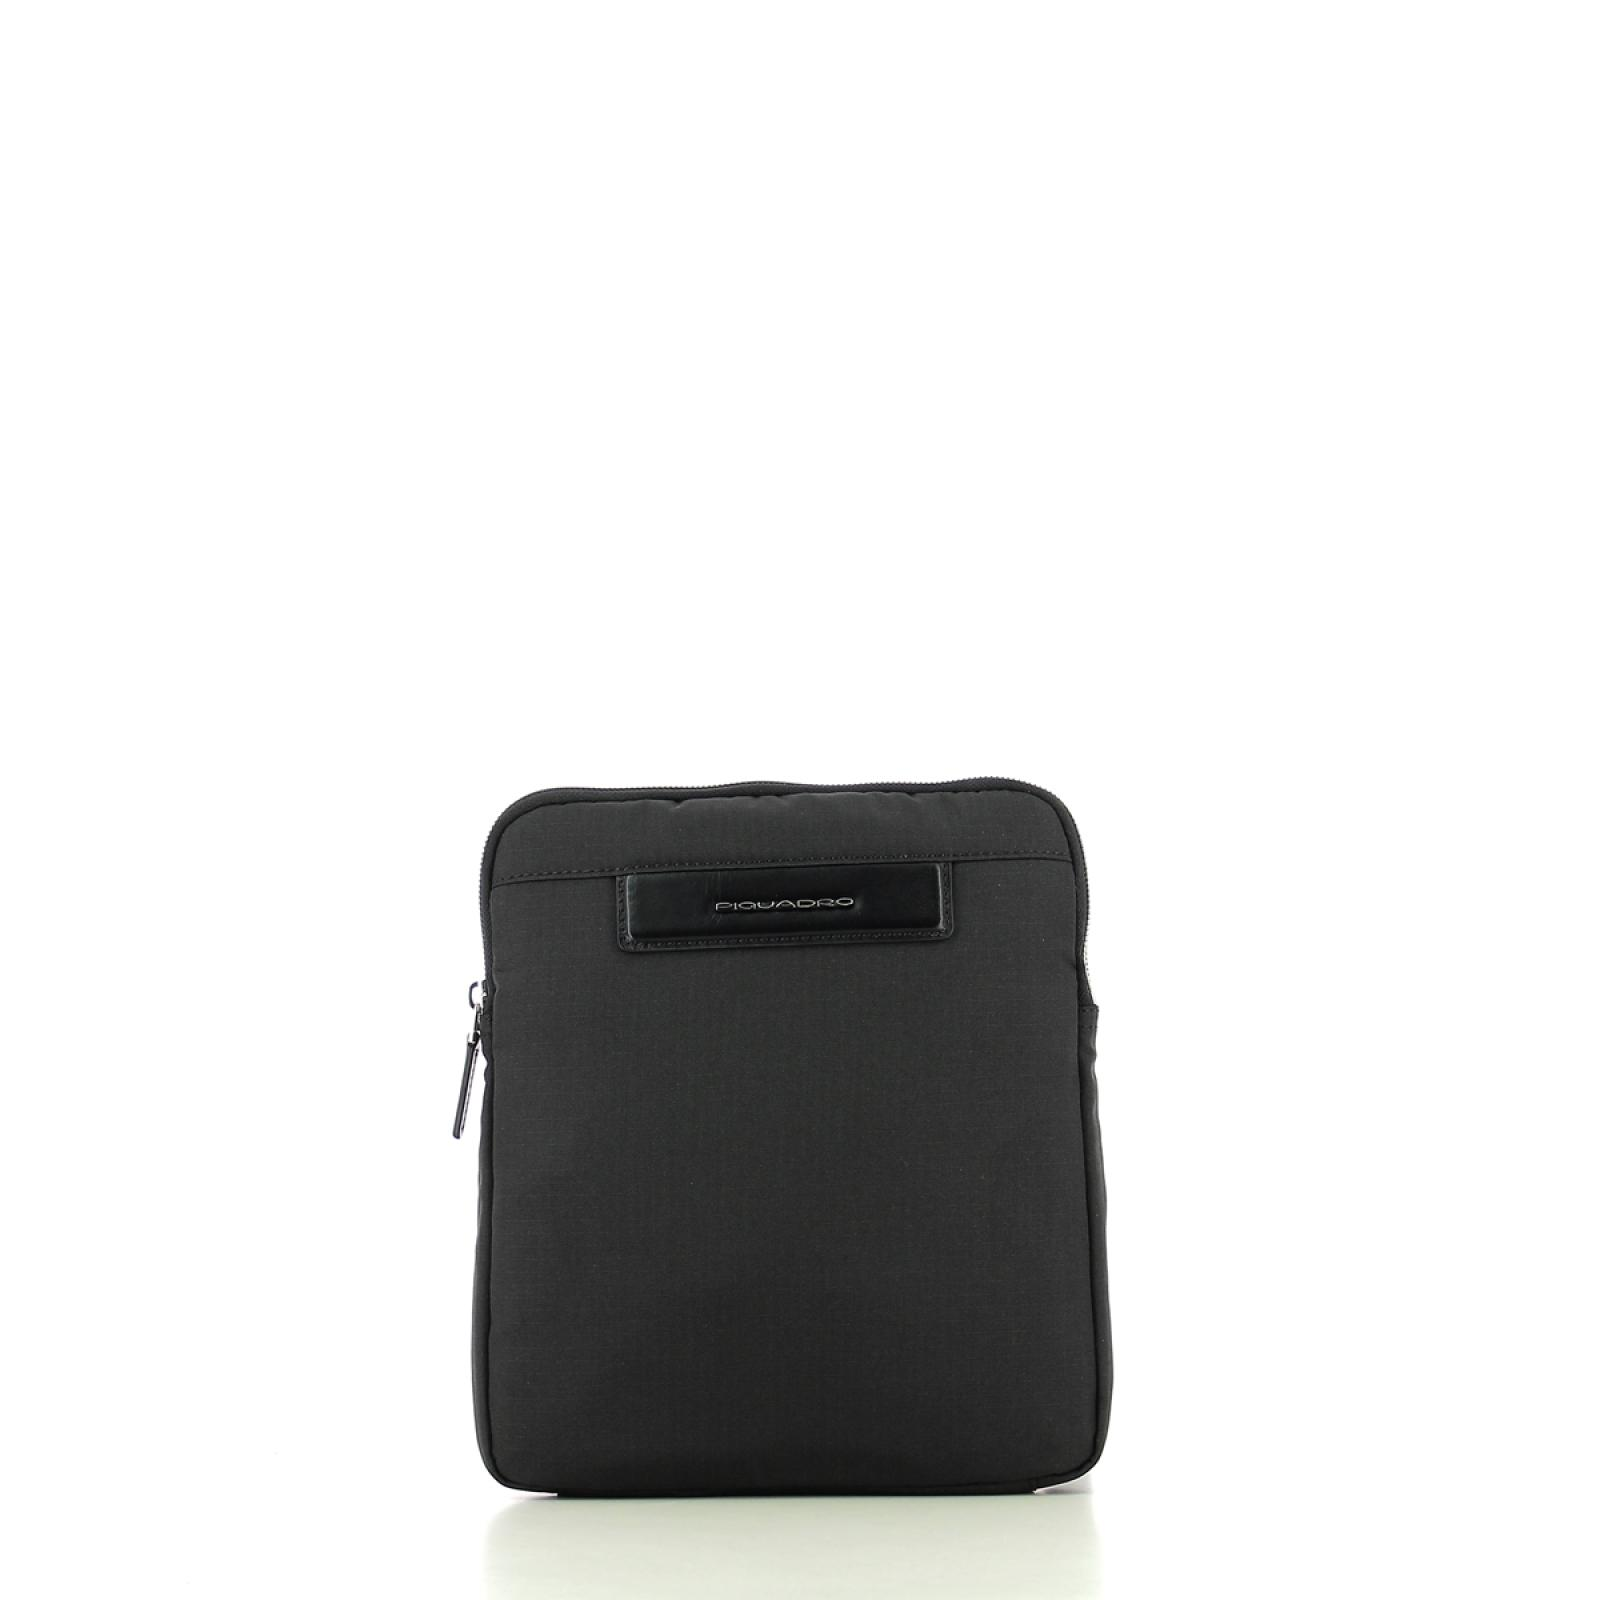 Crossbody pocket bag-NE-UN